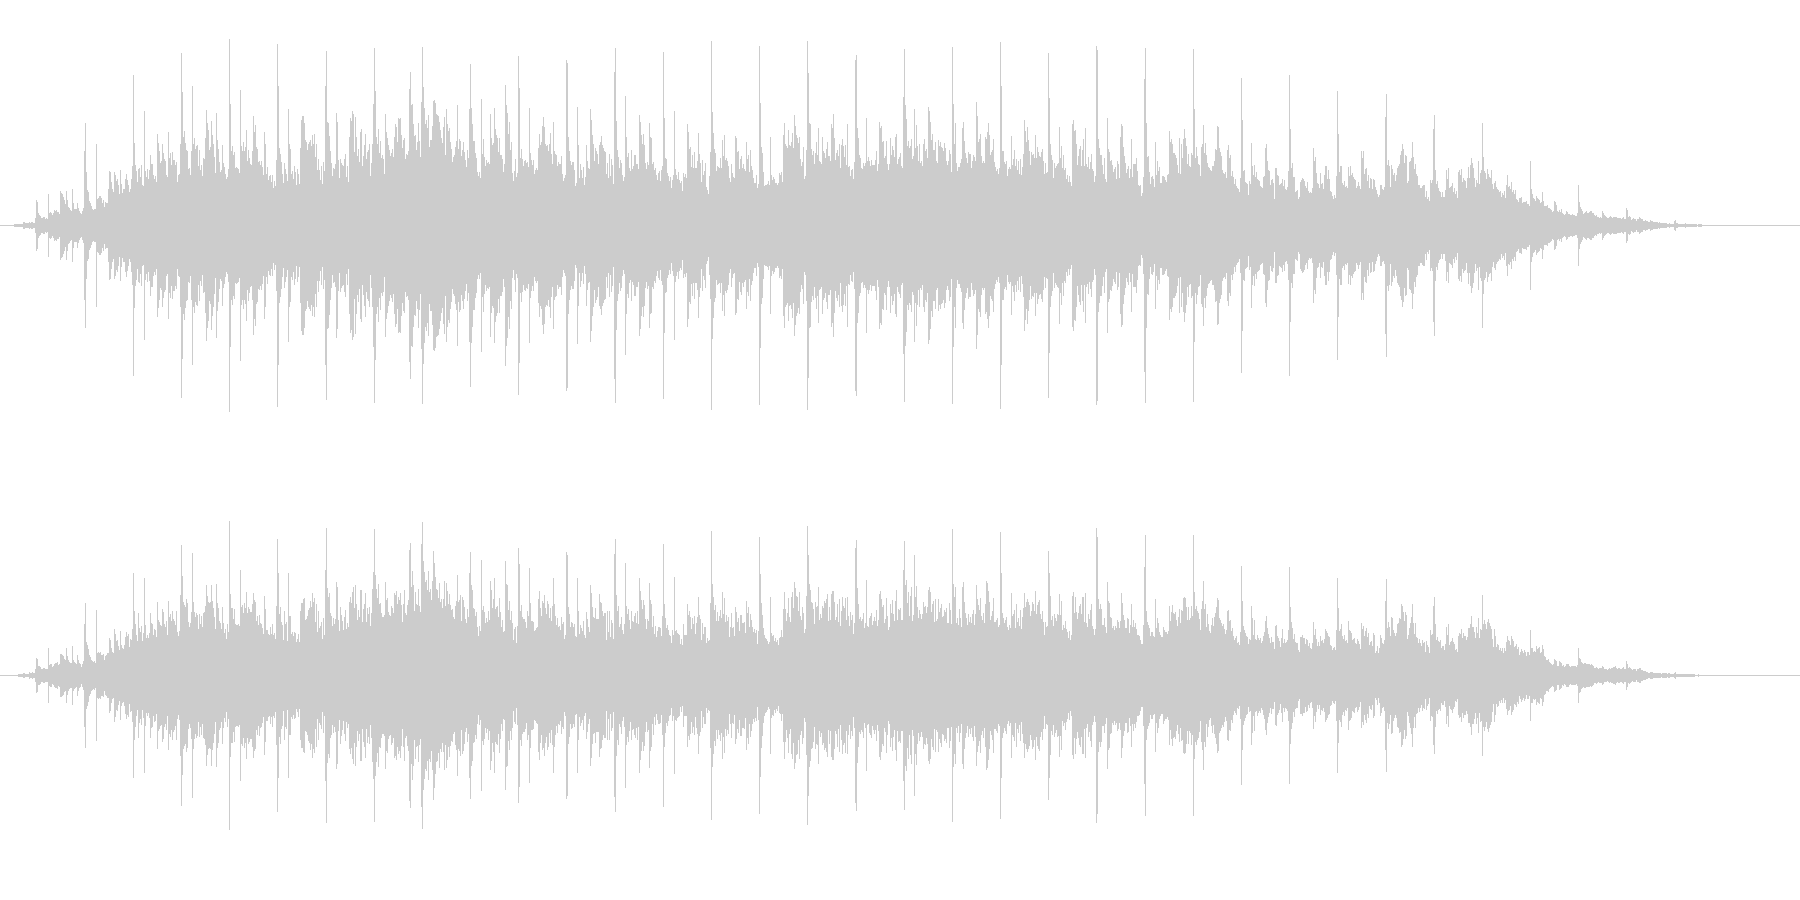 SONHOの未再生の波形